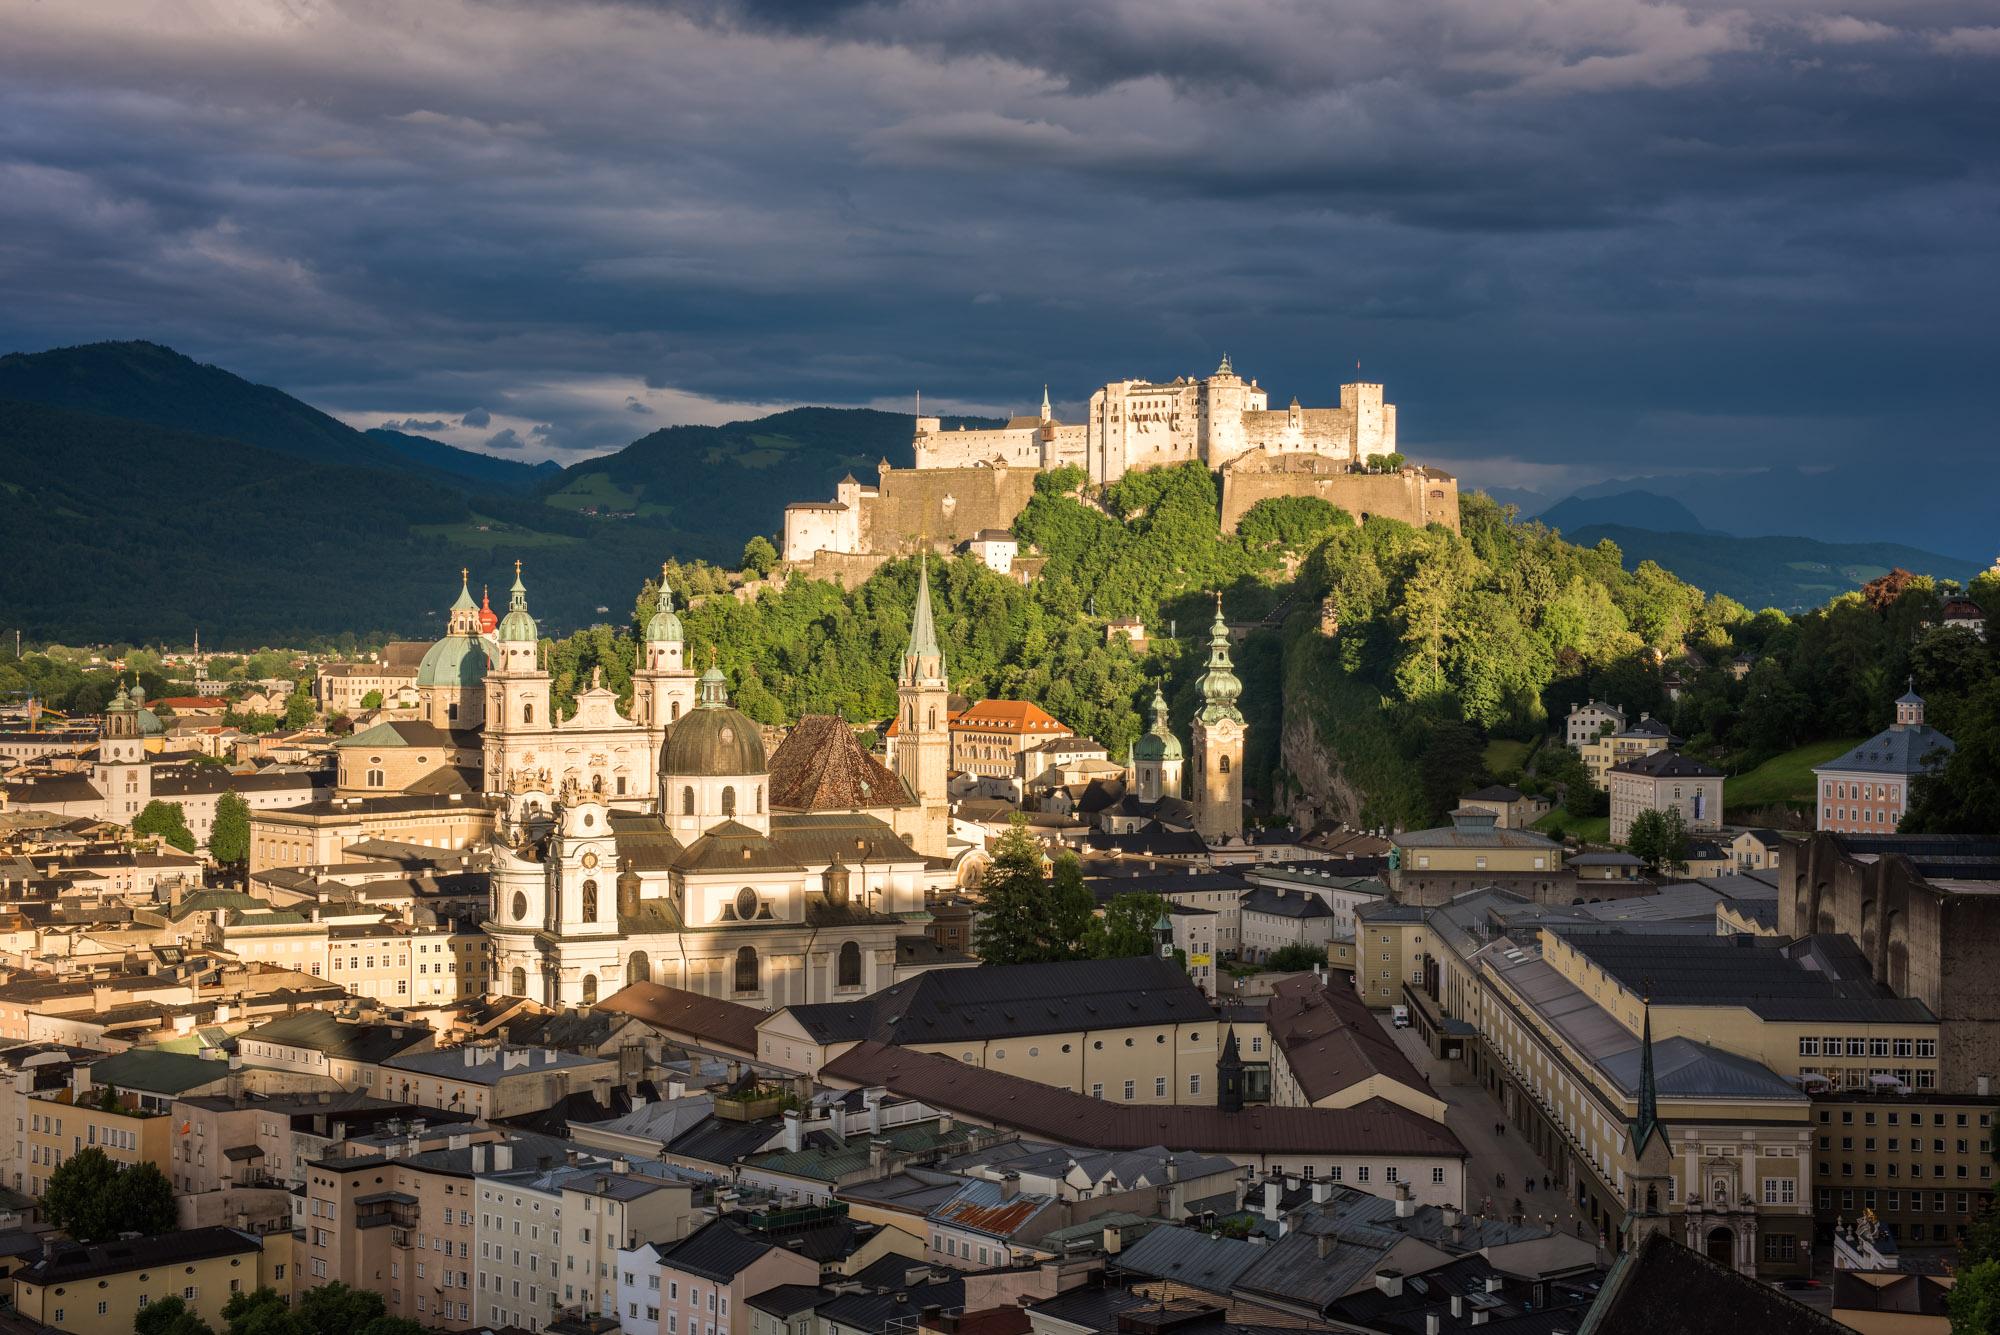 Aerial View of Salzburg Old Town, Austria